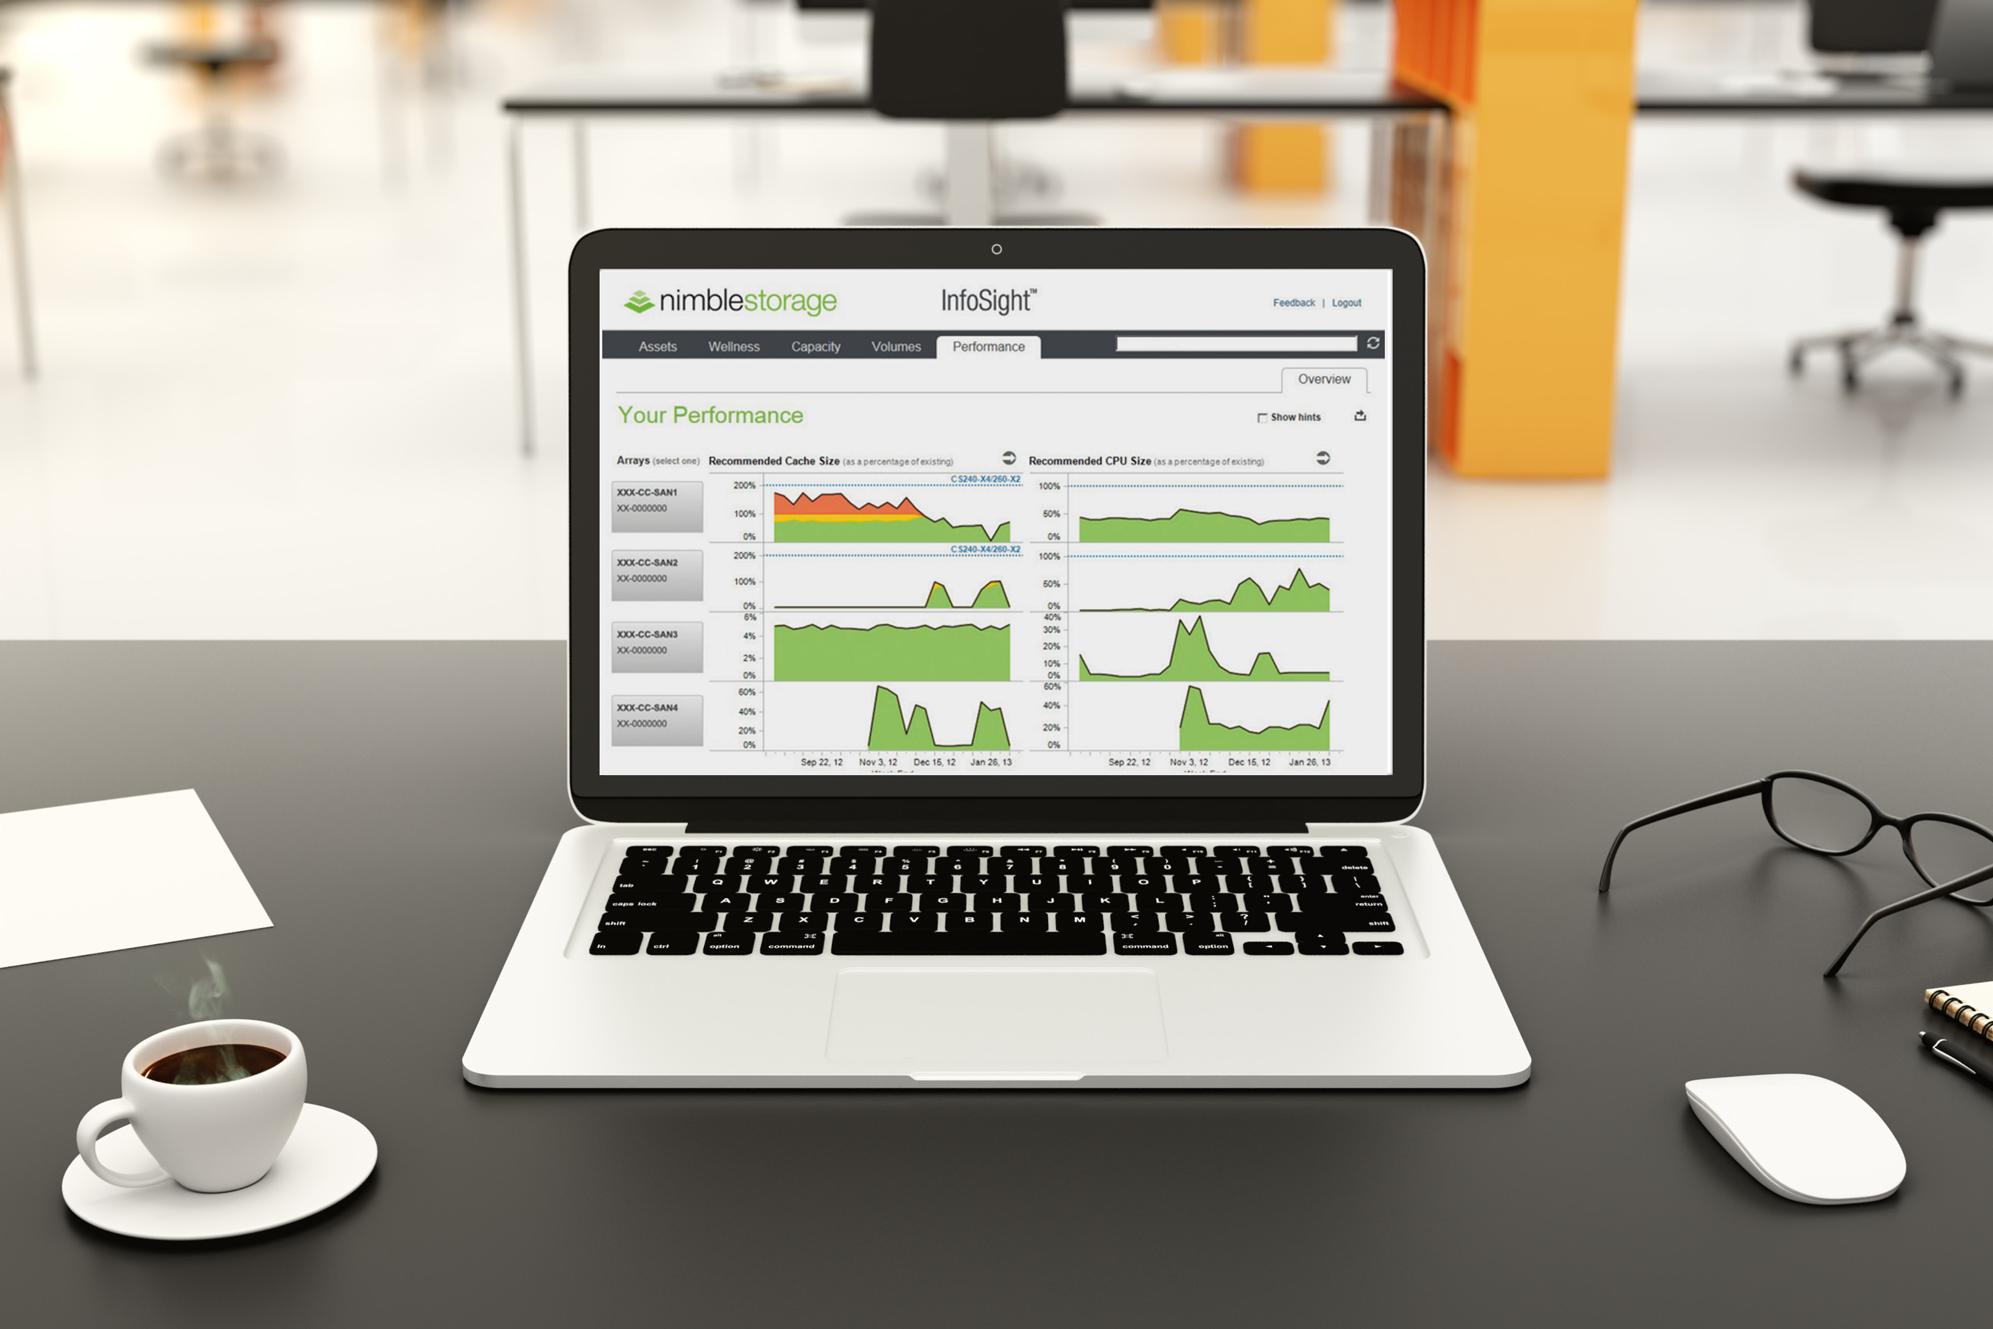 Nimble Storage Infosight – Analyse prédictive et haute performance